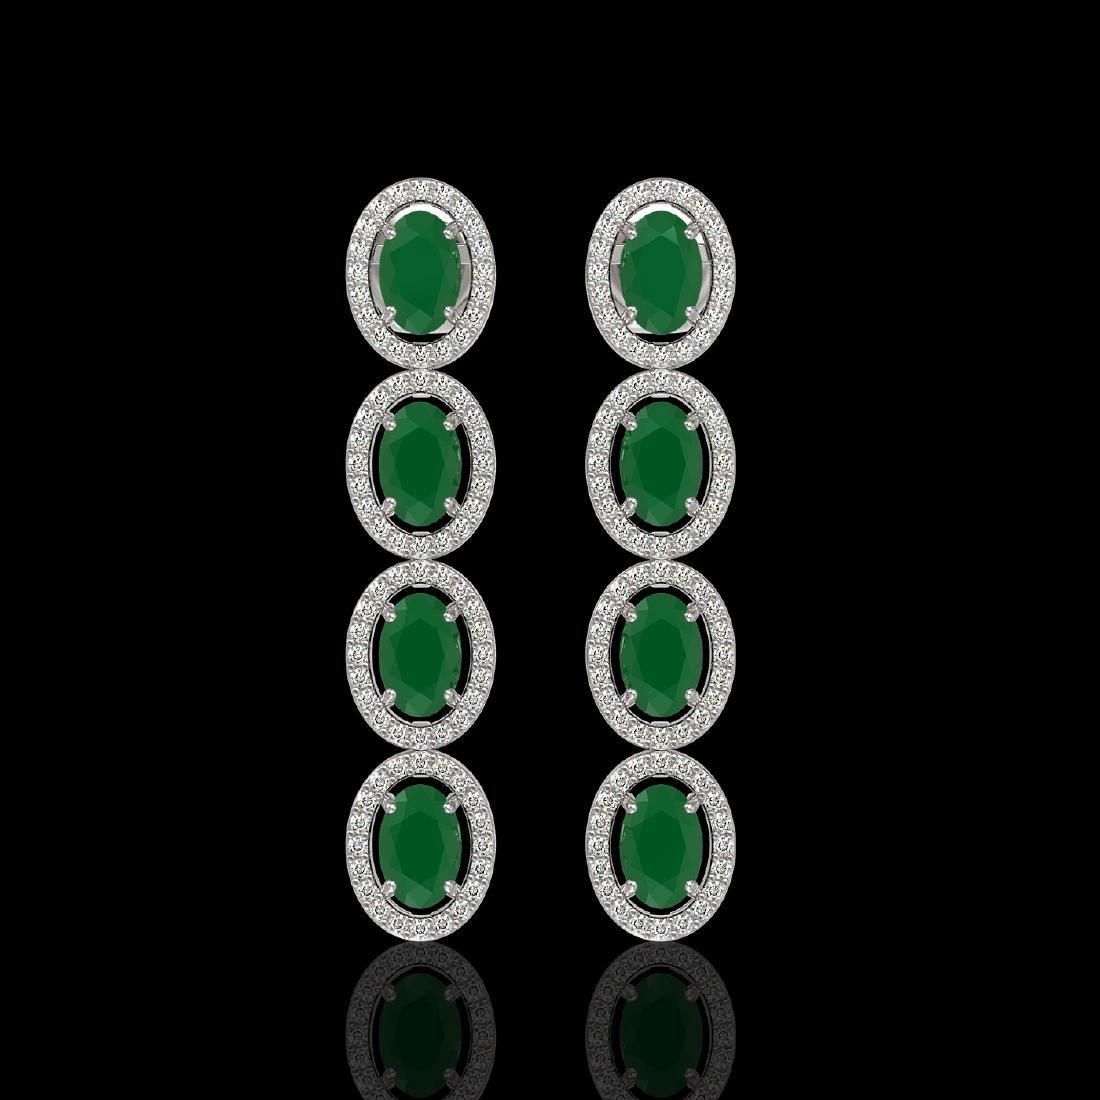 6.47 CTW Emerald & Diamond Halo Earrings 10K White Gold